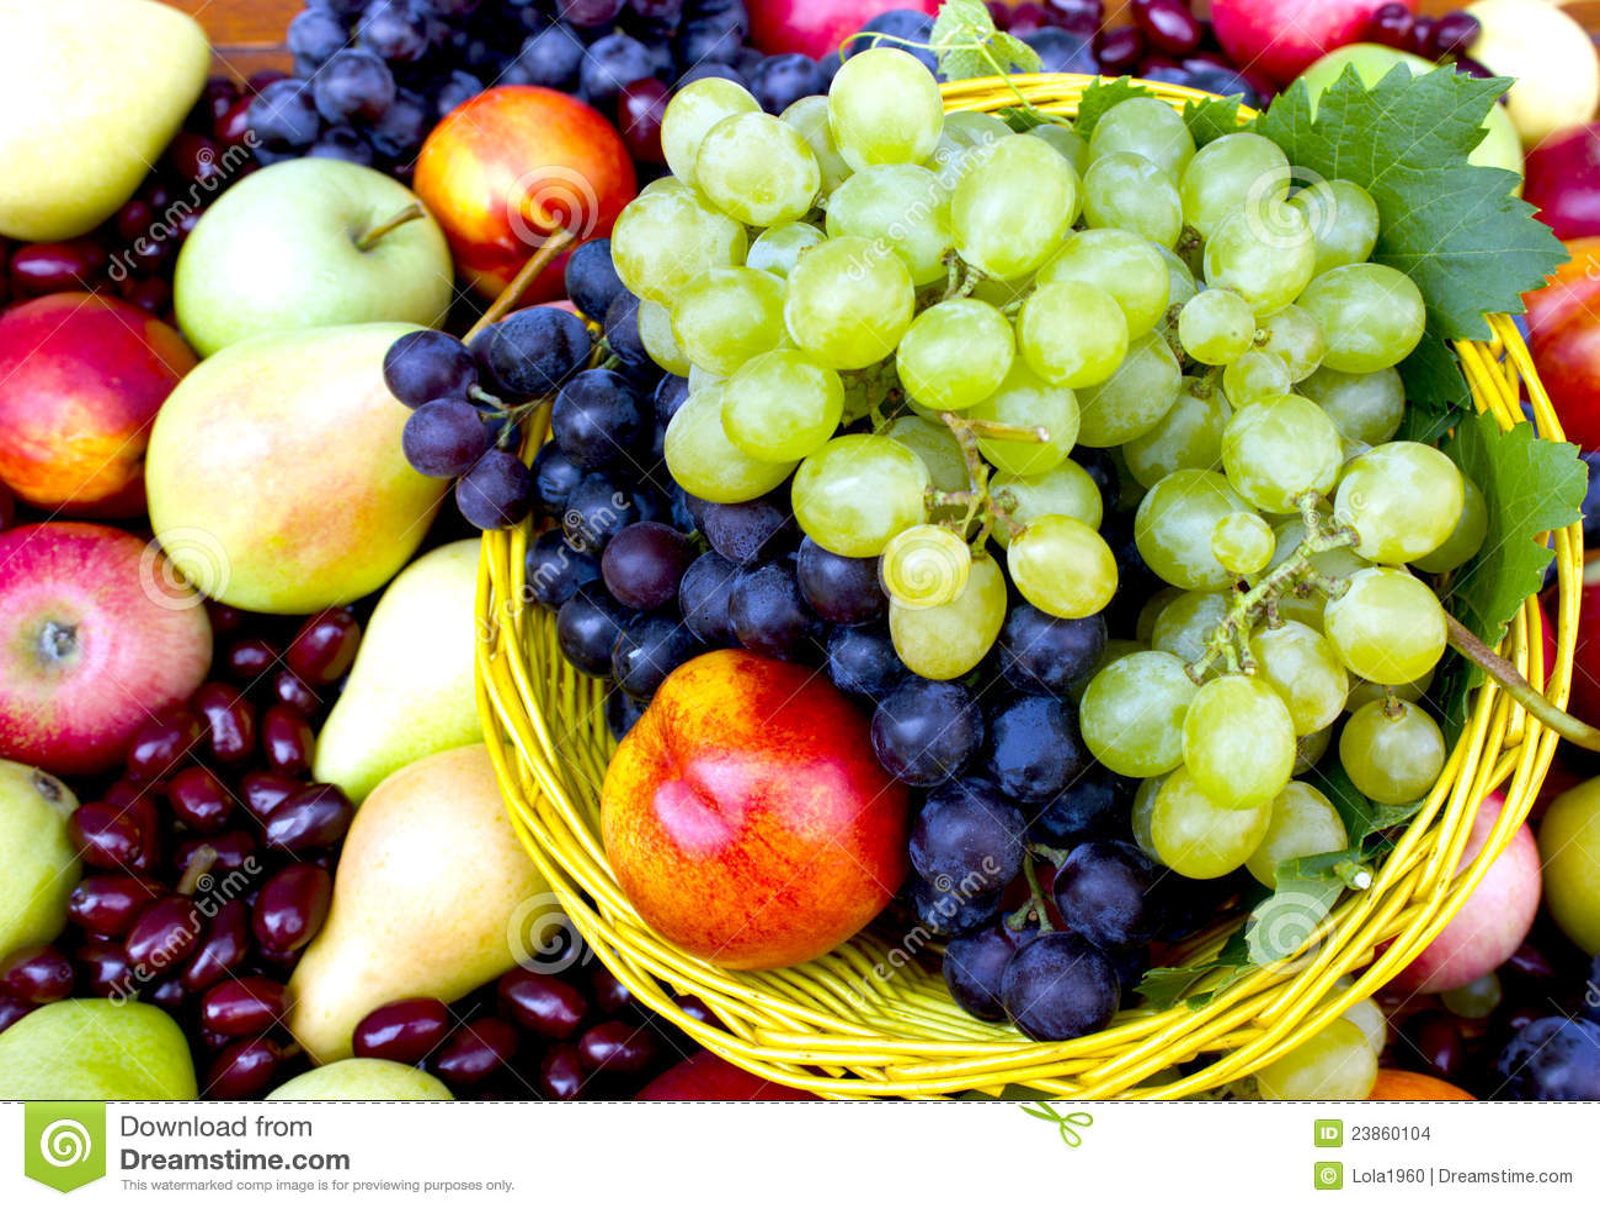 Fresh vegetables ~ Food & Drink Photos ~ Creative Market